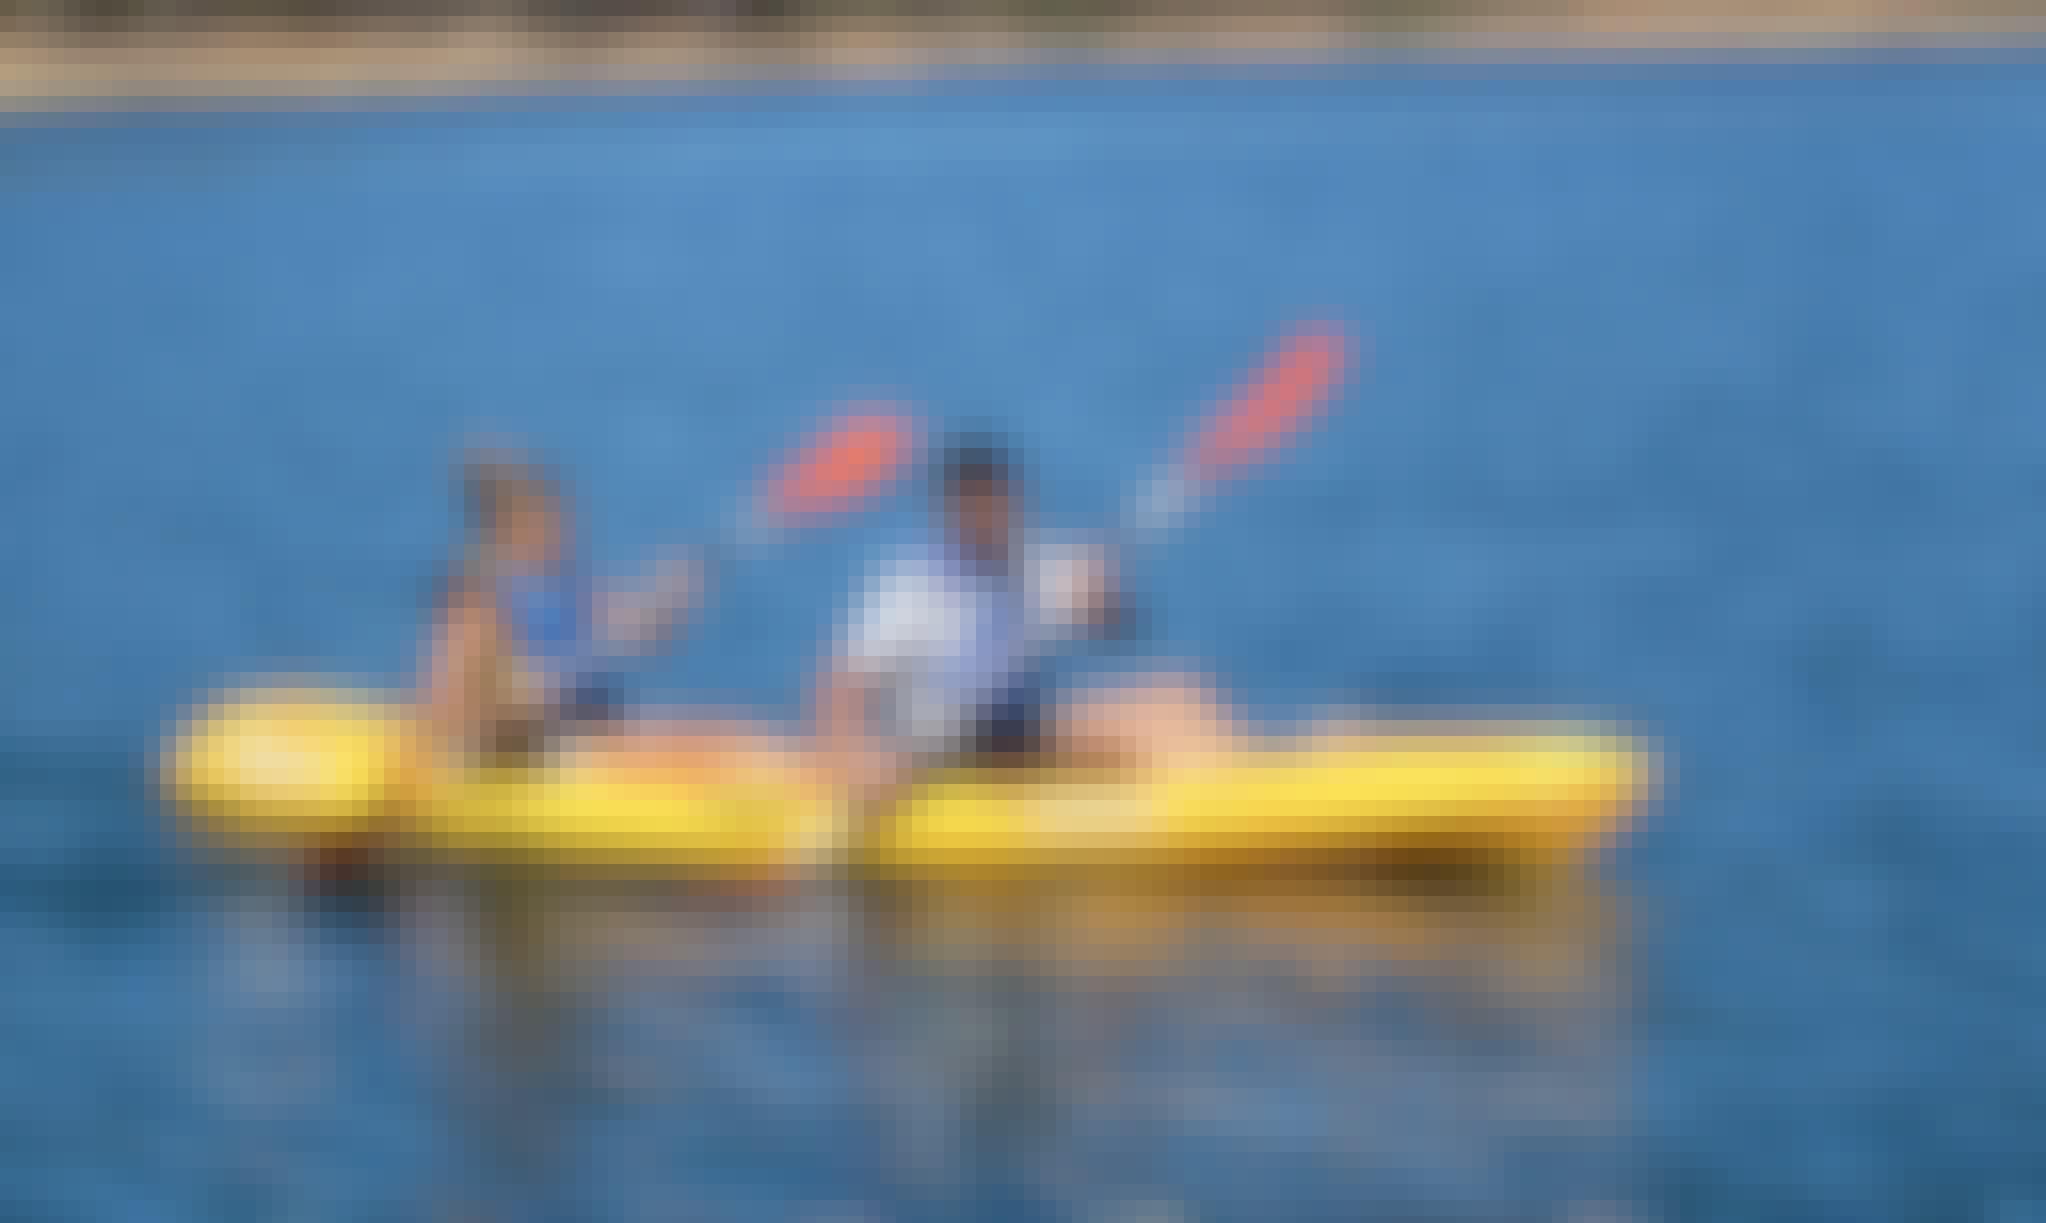 Doubles Kayak Tours in Barragem de Santa Clara, Portugal